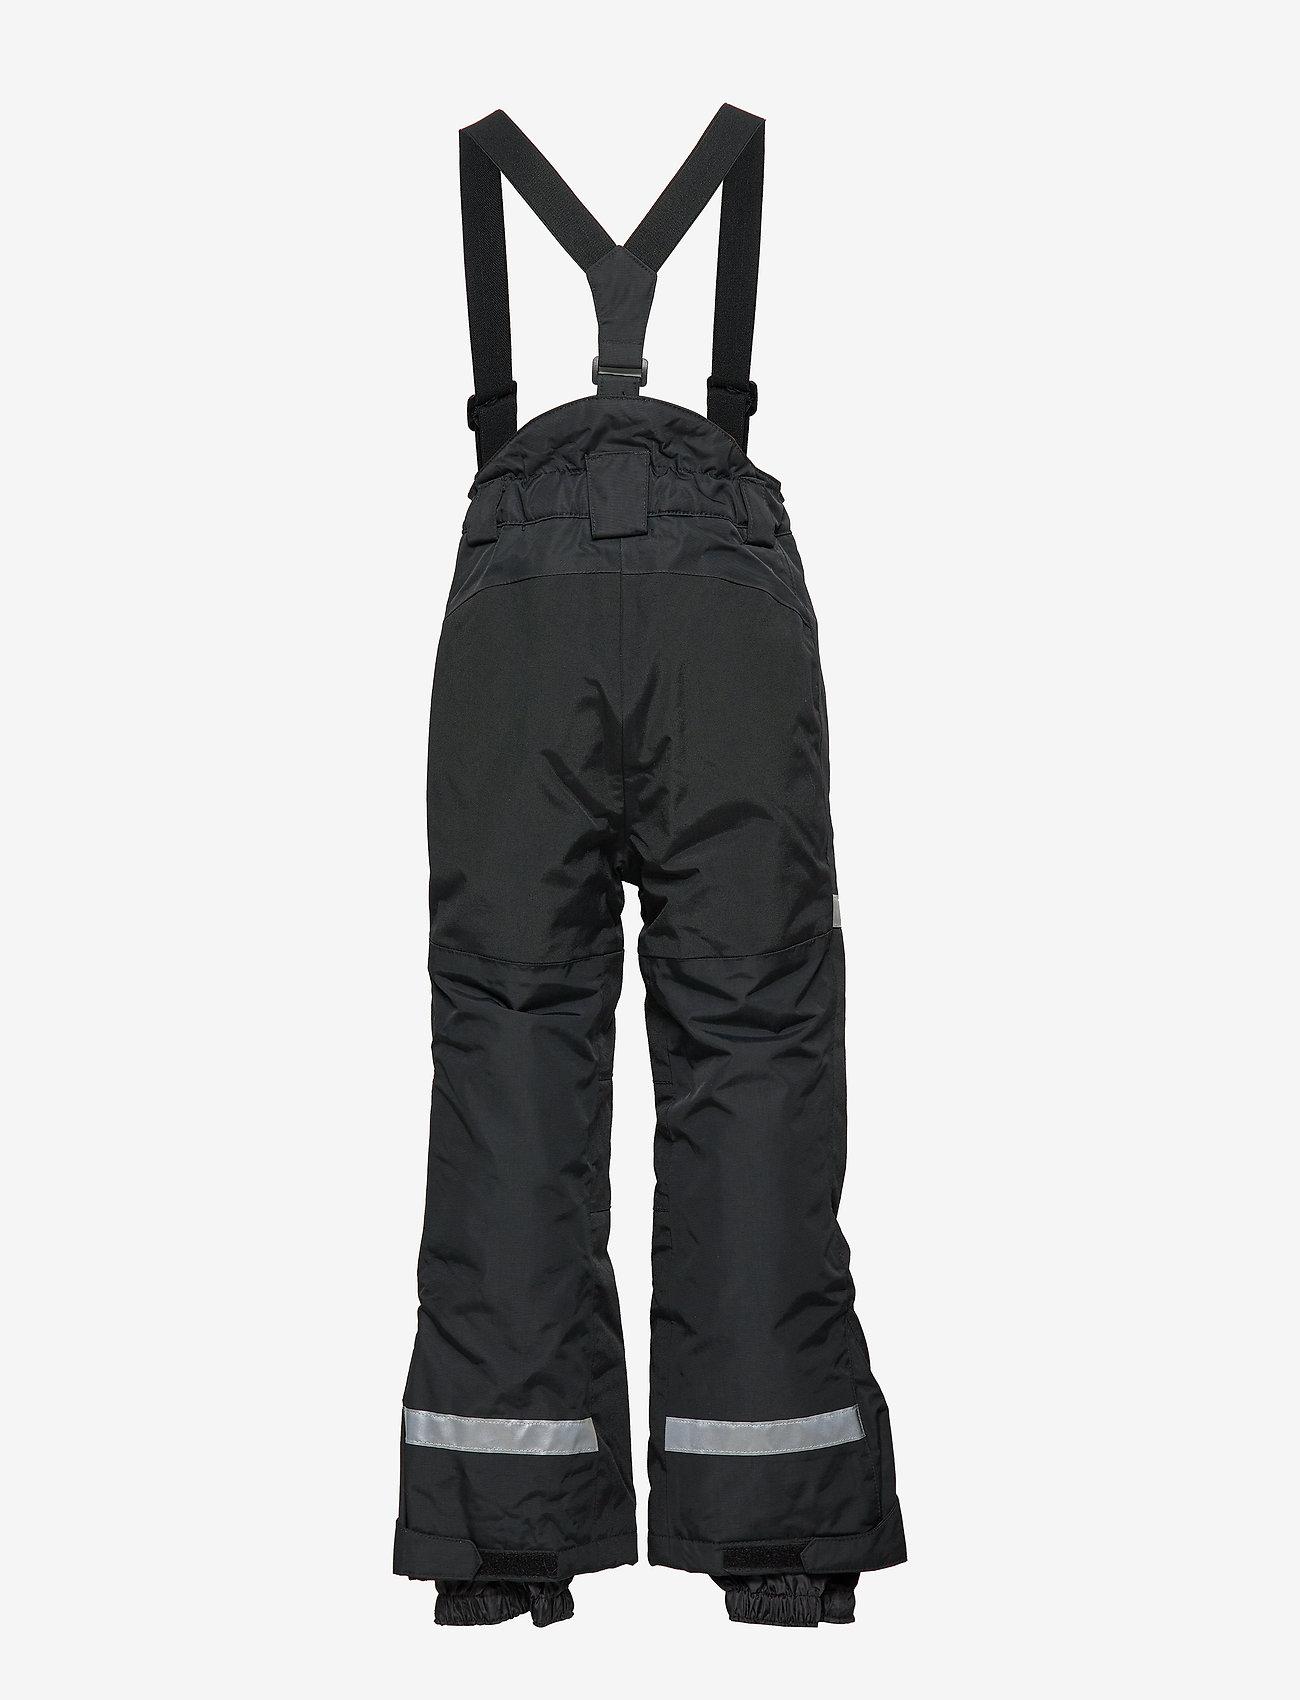 Lindex - FIX Black ski trousers with braces - schneehose - black - 1